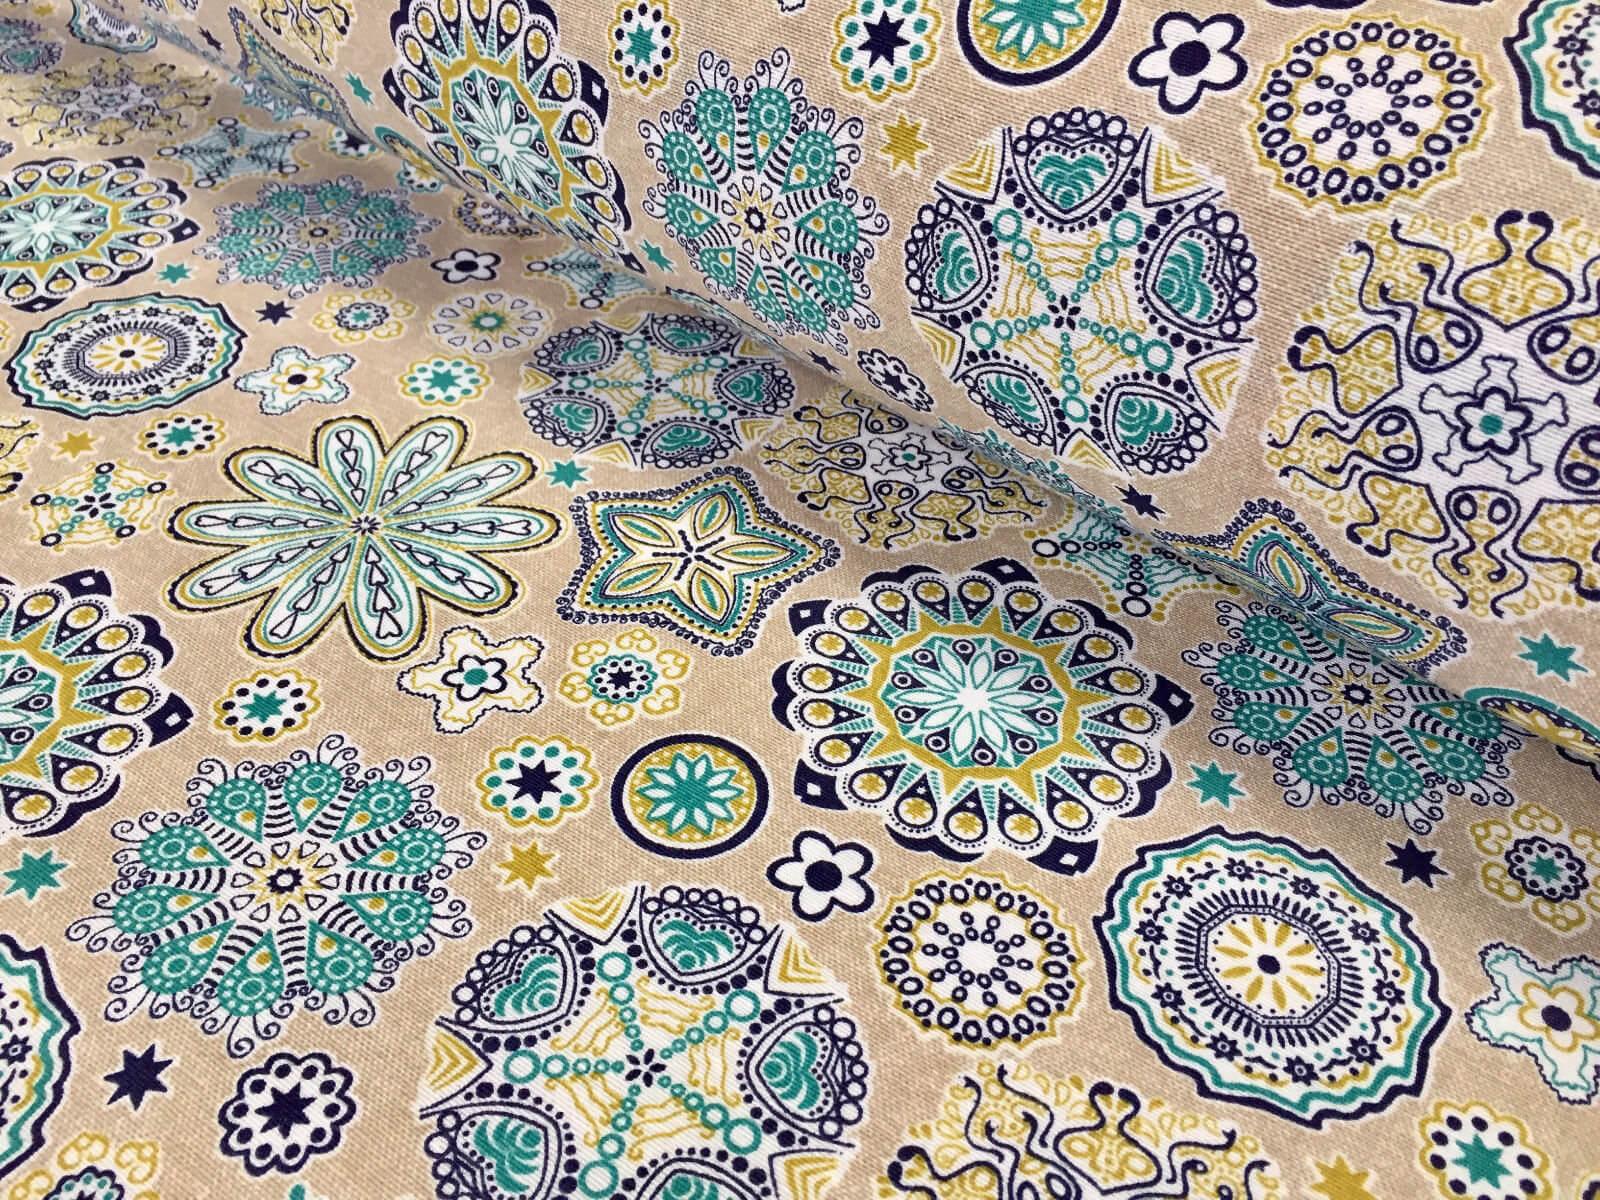 aquarius-flower-mandala-stars-hippy-print-fabric-curtain-upholstery-material-140cm-wide-blue-5aad4f6e1.jpg